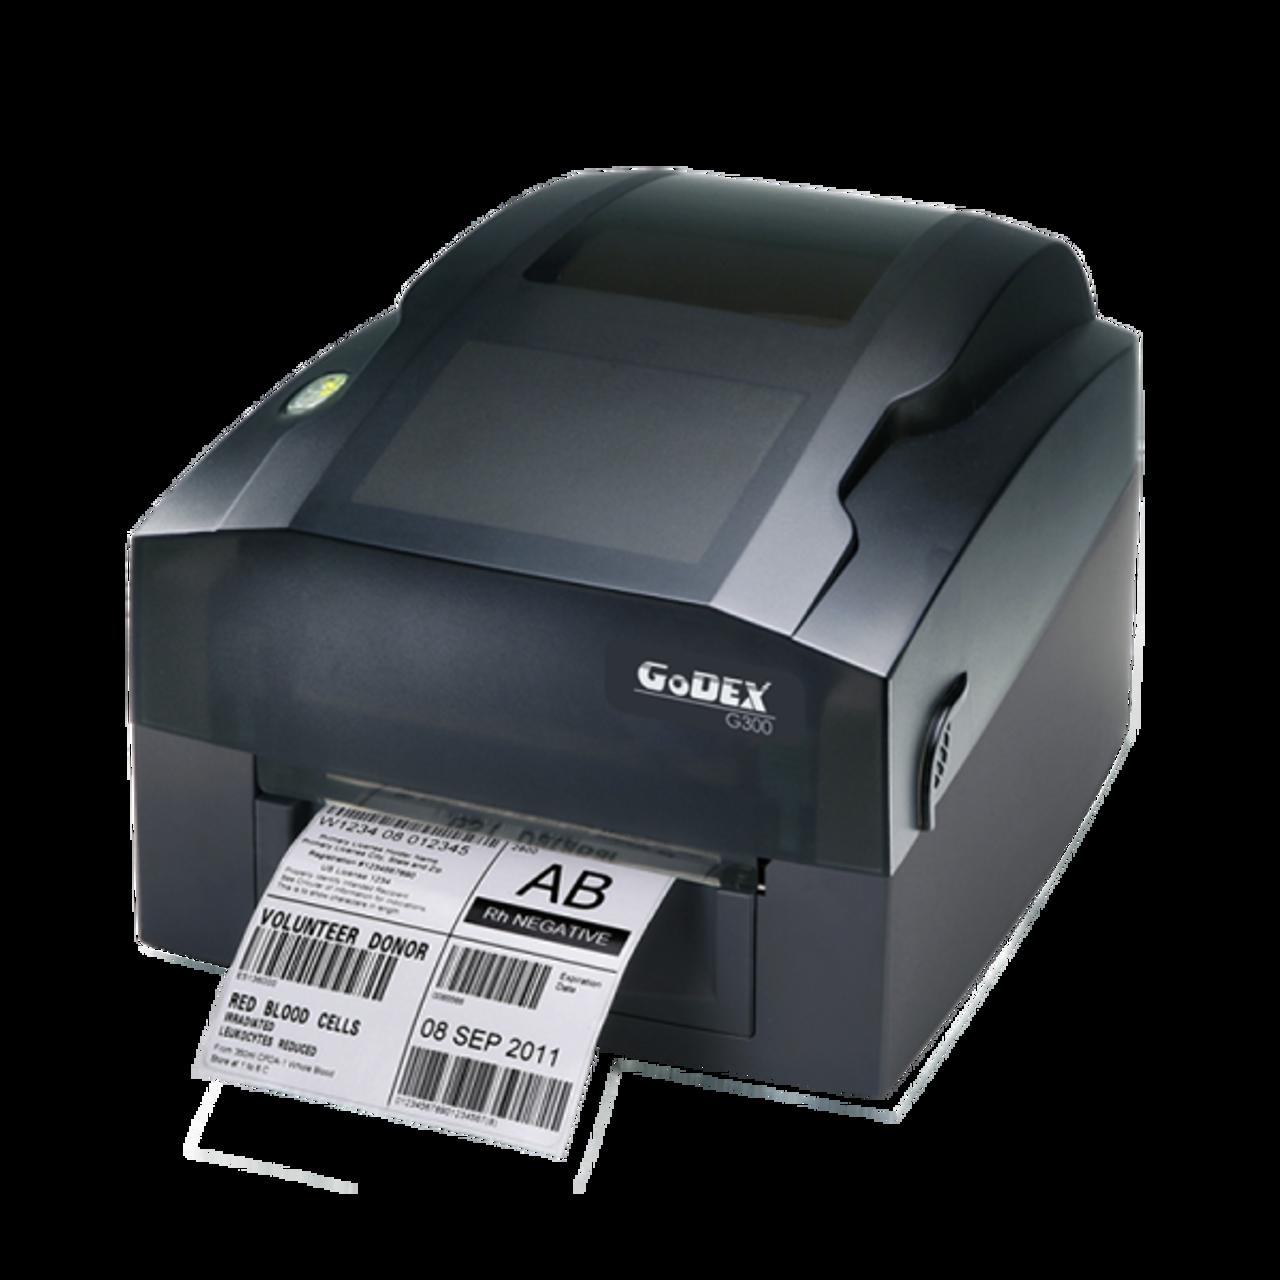 "Godex G300 4"" Thermal Transfer Barcode Label Machine, 203 dpi, 4 ips"